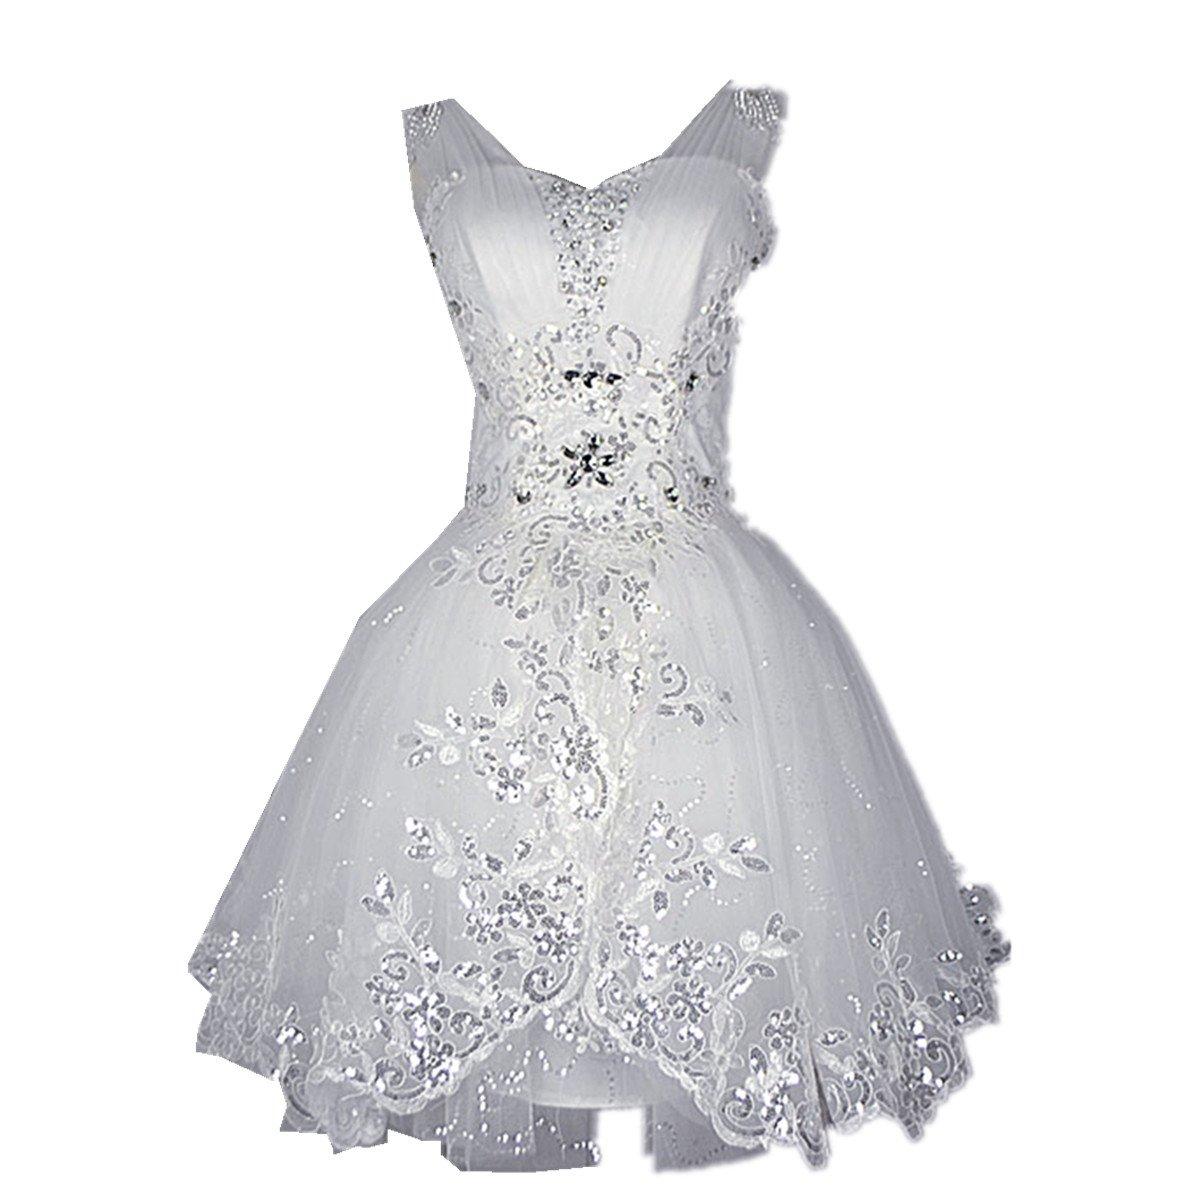 Zorabridal Women's Sweetheart Shiny Crystal Short Wedding Dress (14, White)